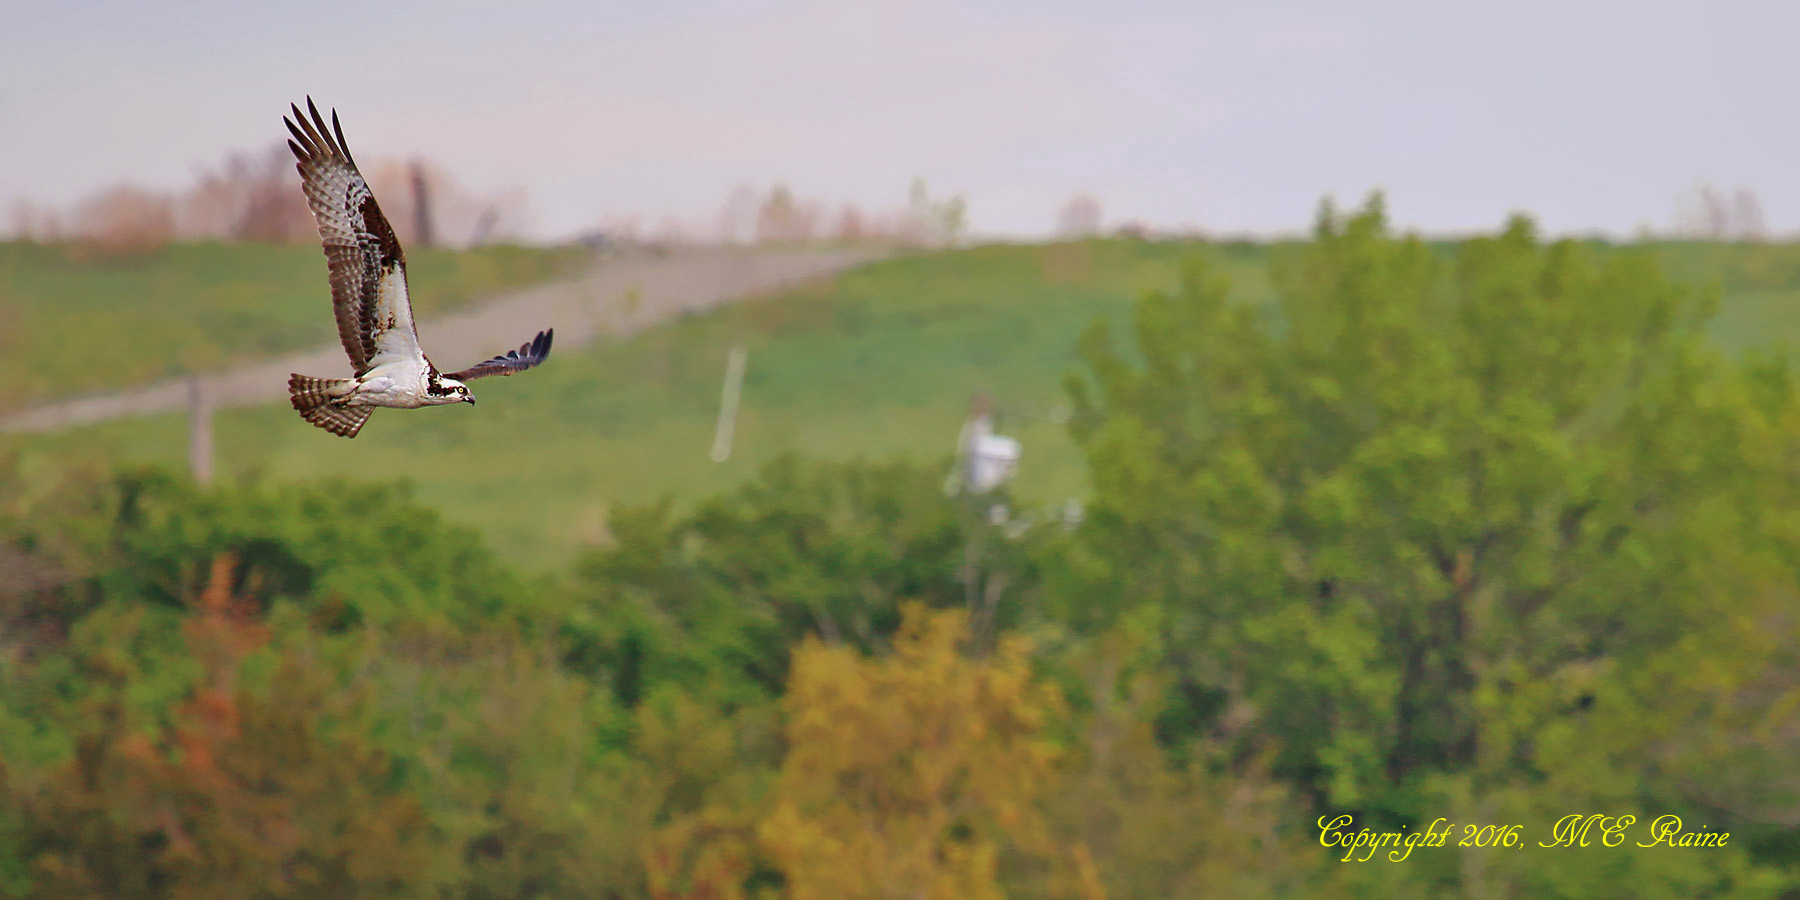 Osprey 017a1f RchrdDKorte Park Mdwlnds NJ 042516 OK FLICKR